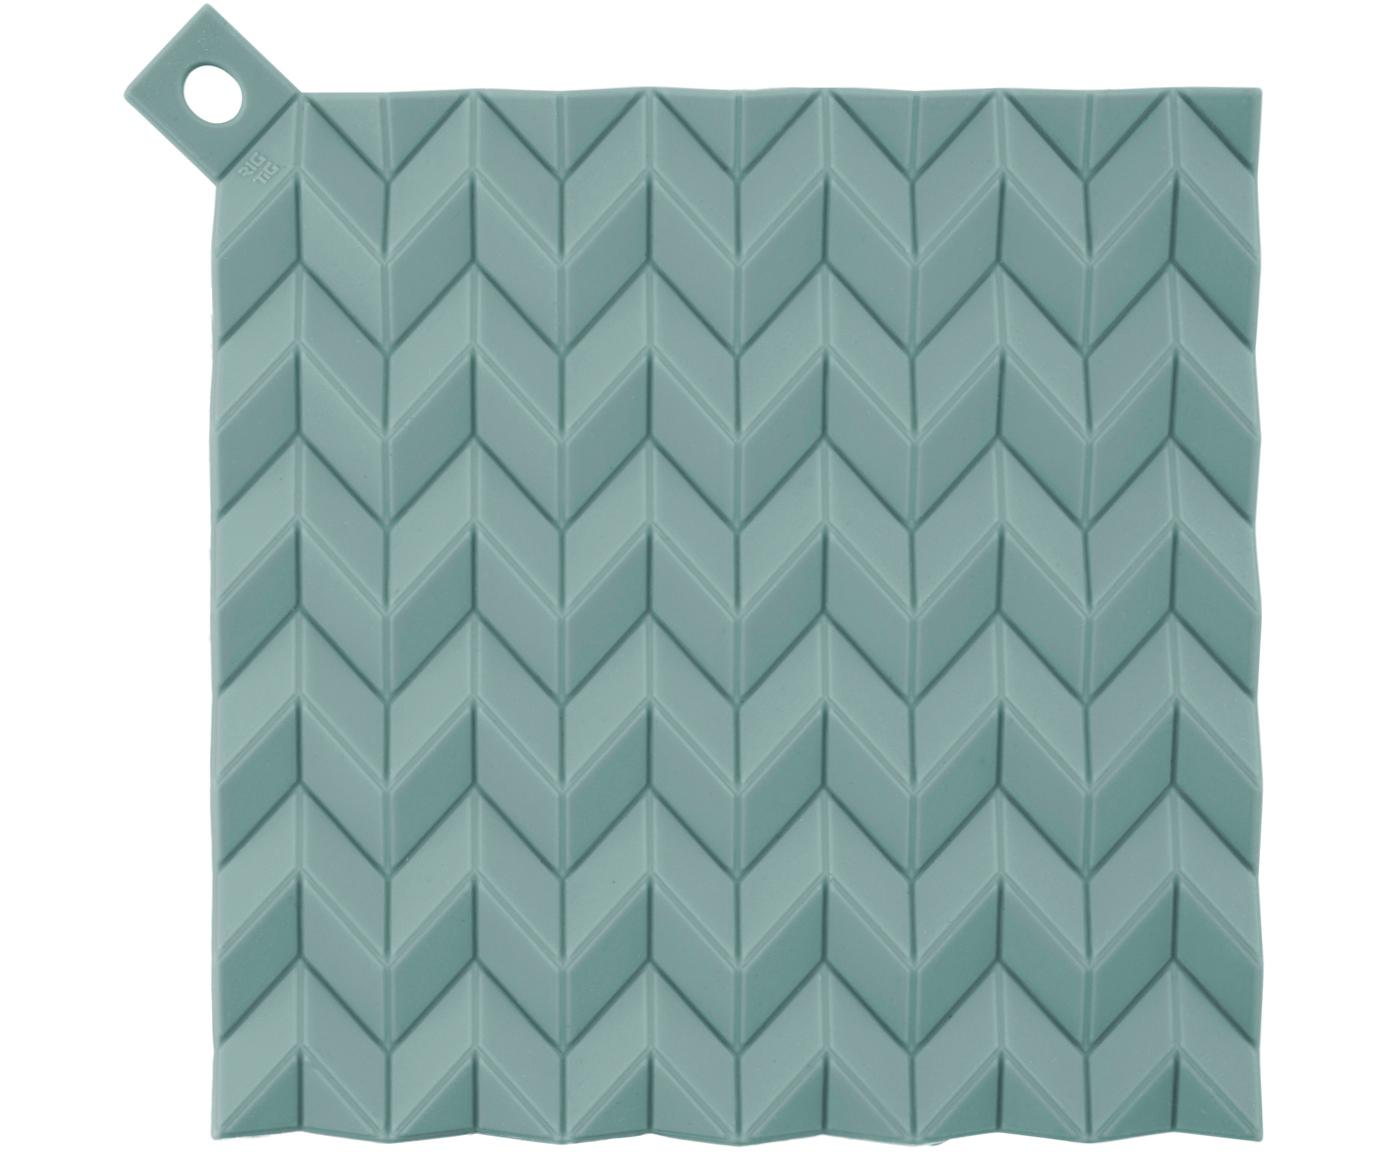 Pannenlappen Hold On, 2 stuks, Siliconen, Turquoise, 21 x 21 cm